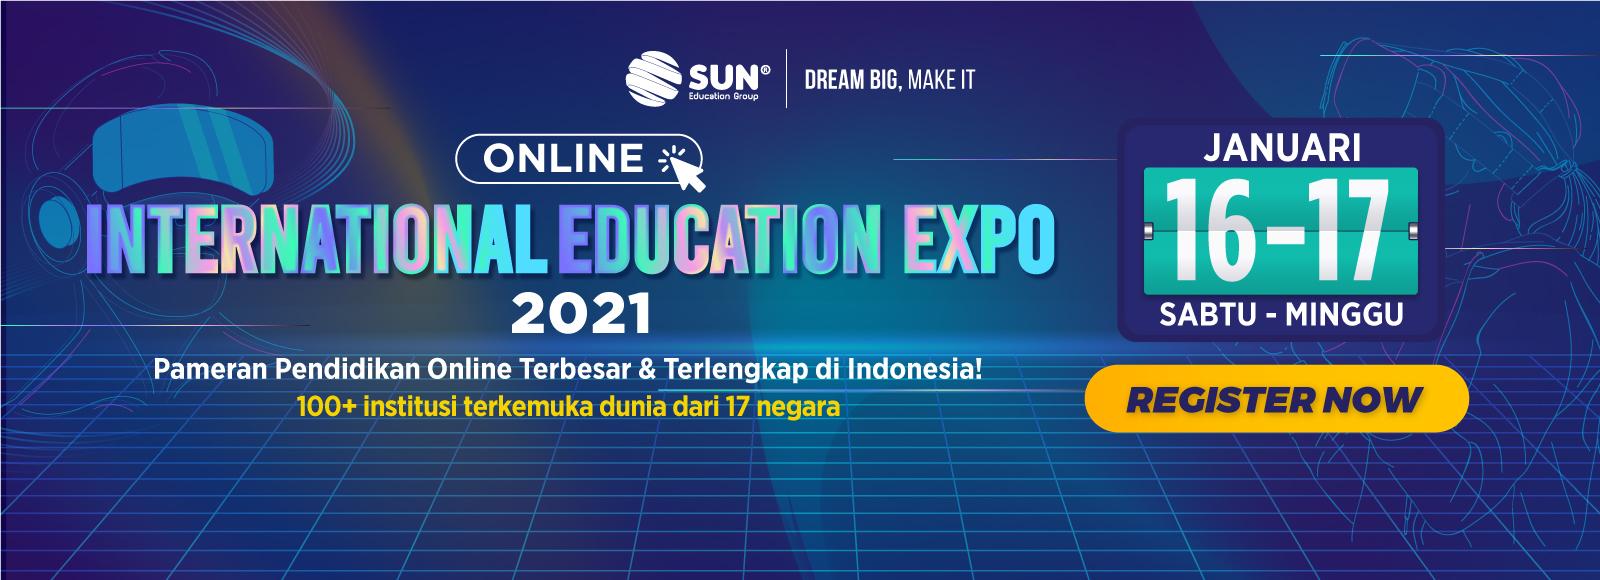 Study Overseas Education Consultant Sun Education Group